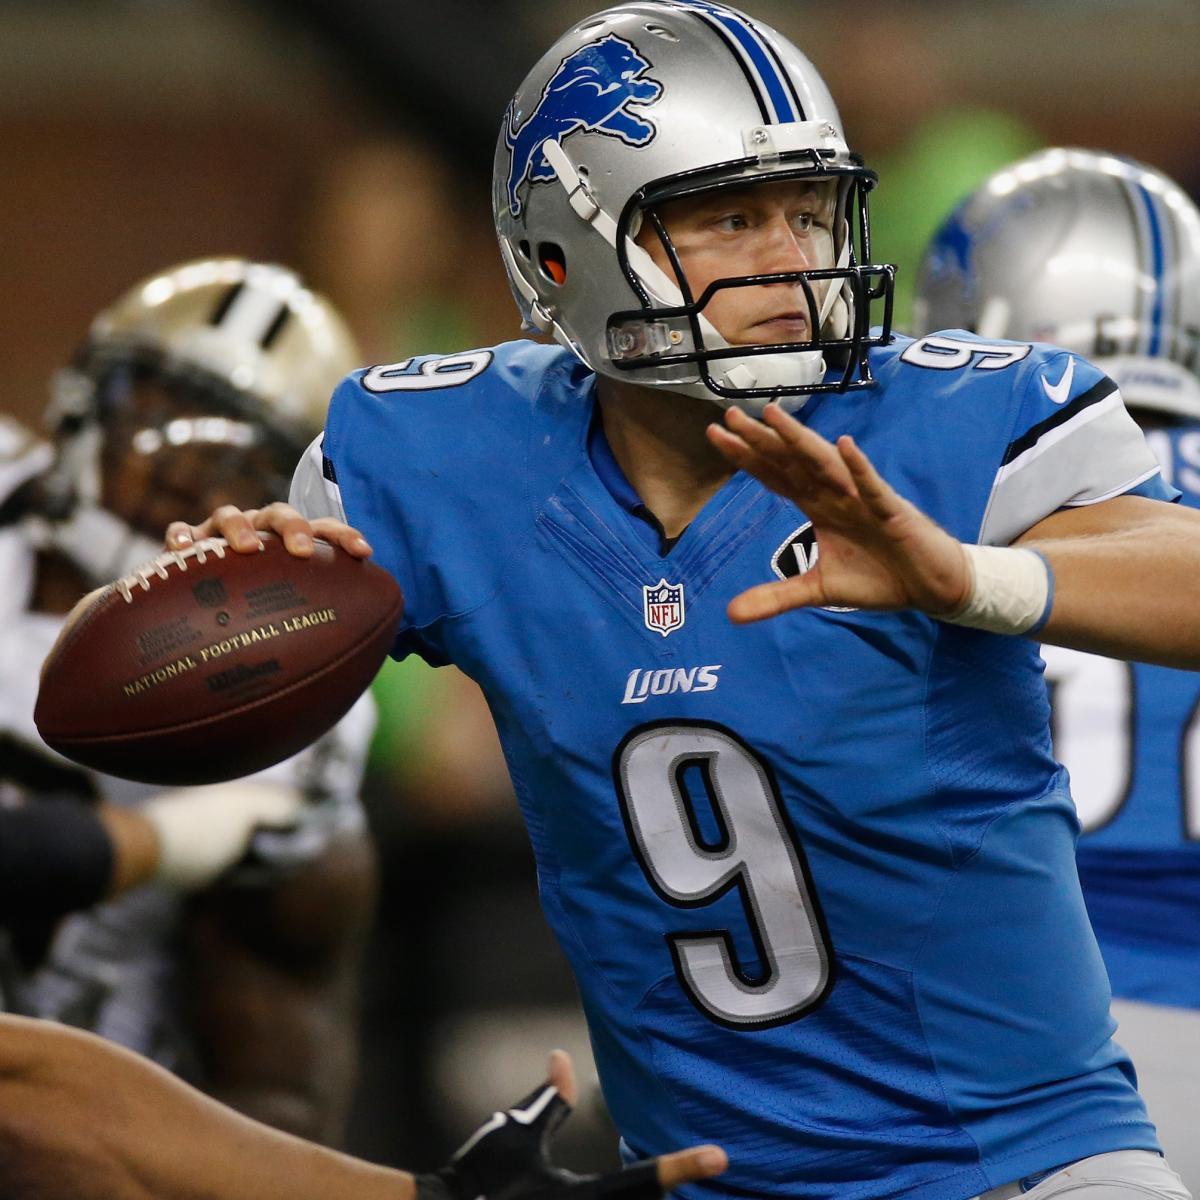 Denver Broncos Vs Detroit Lions Live Score Highlights And: NFL Week 8 Picks: Predictions For Favorites And Underdogs